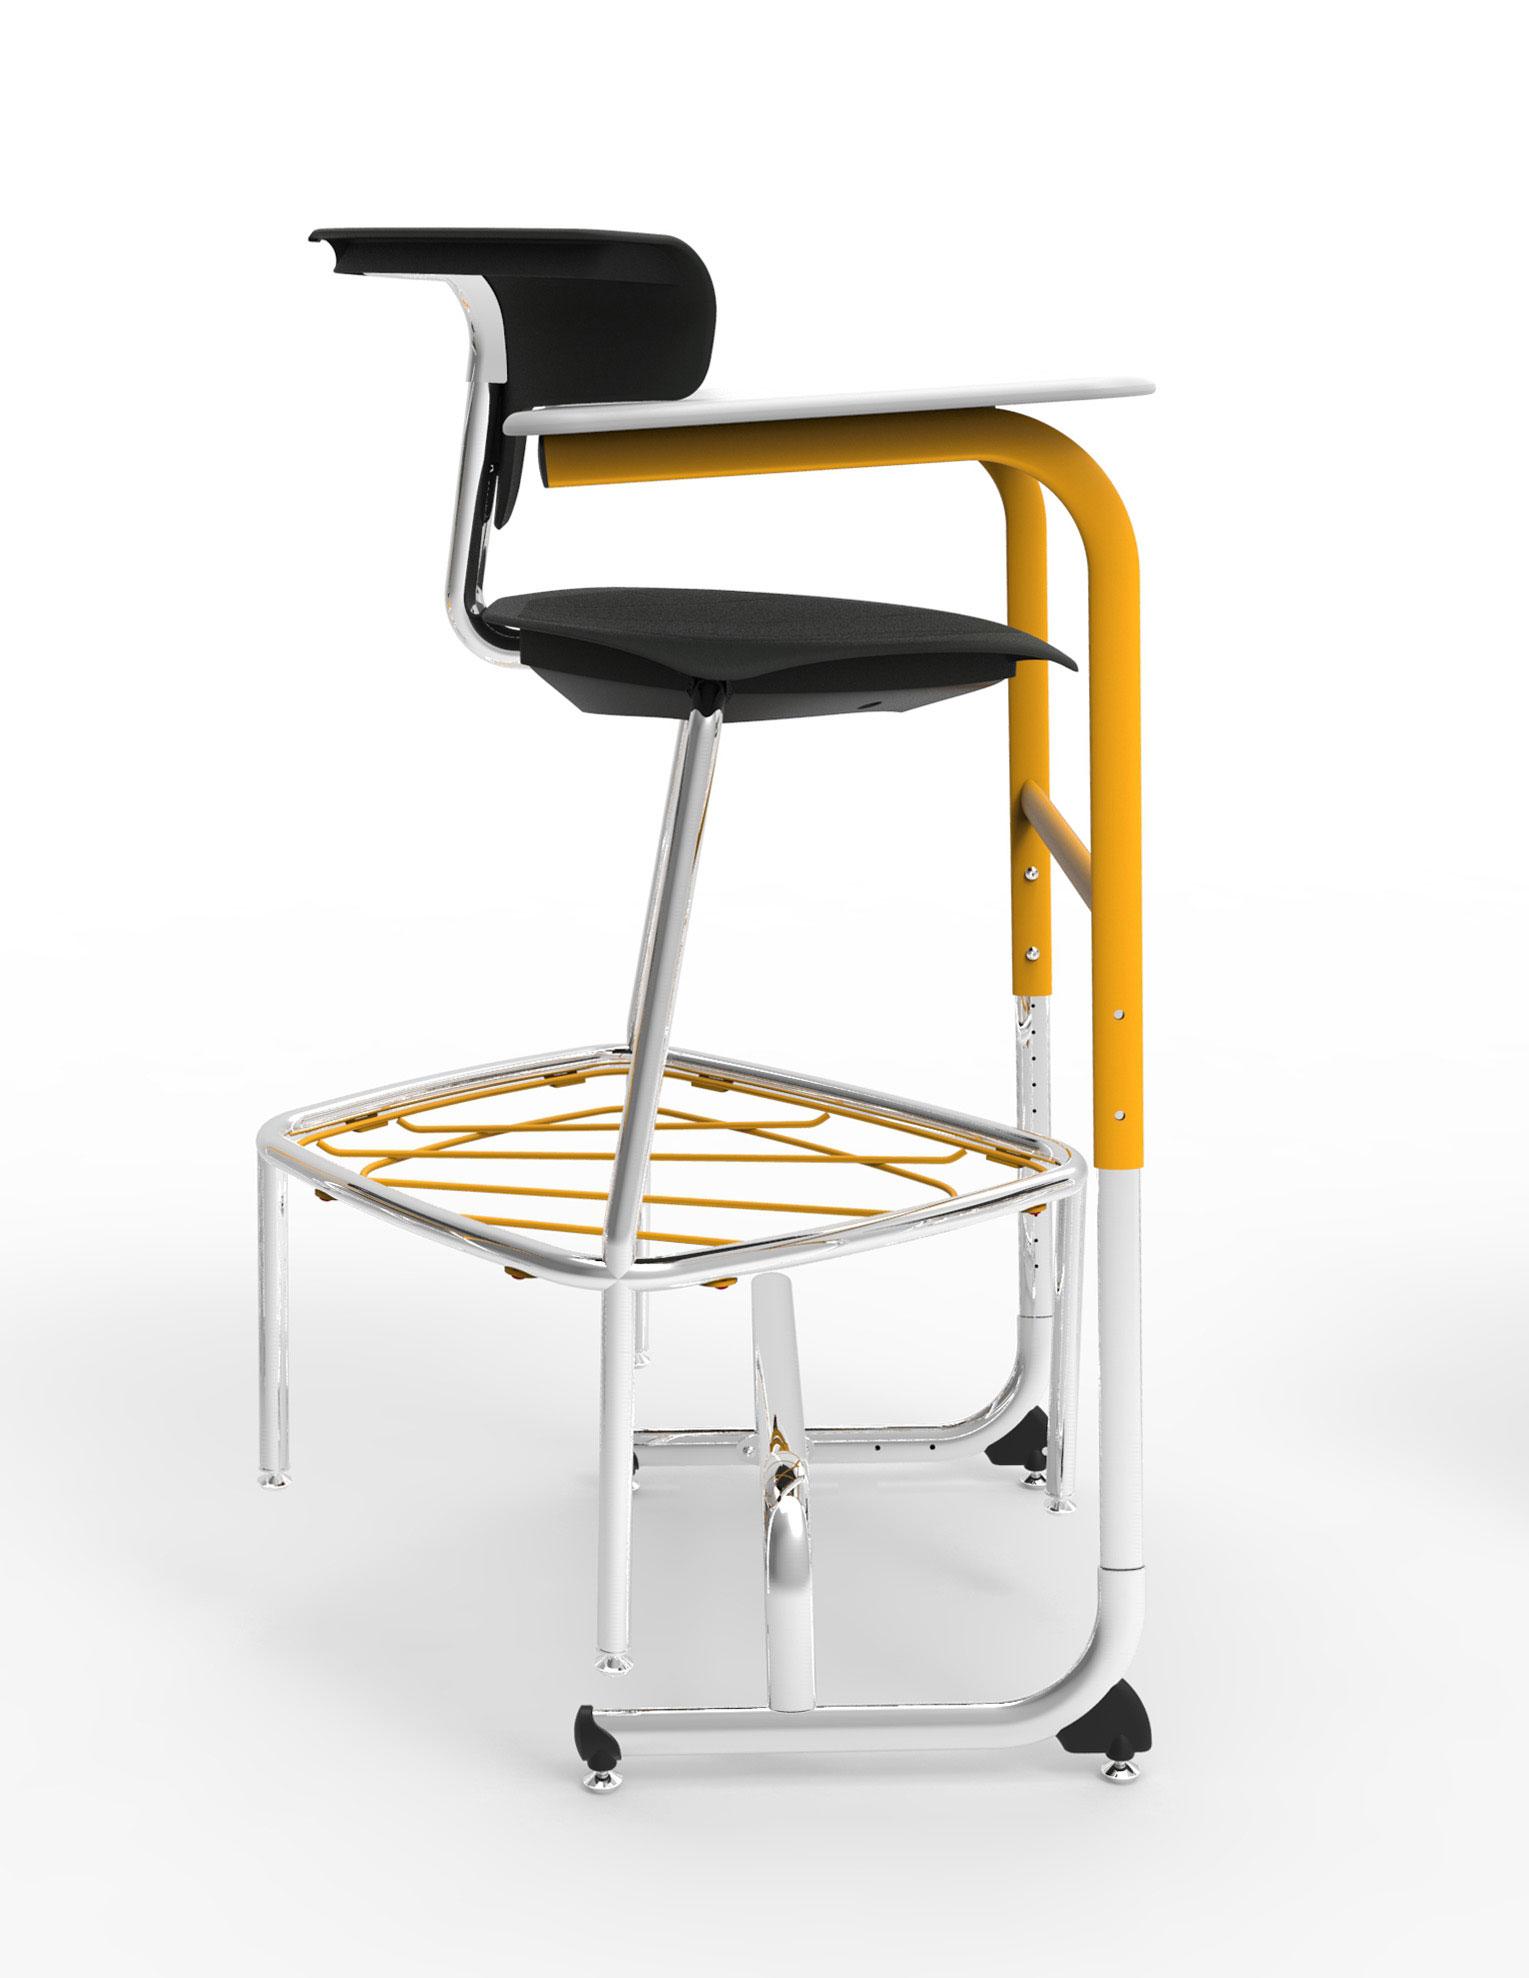 Ruckus_stool_30_IntellectWave_SitStand_2.jpg